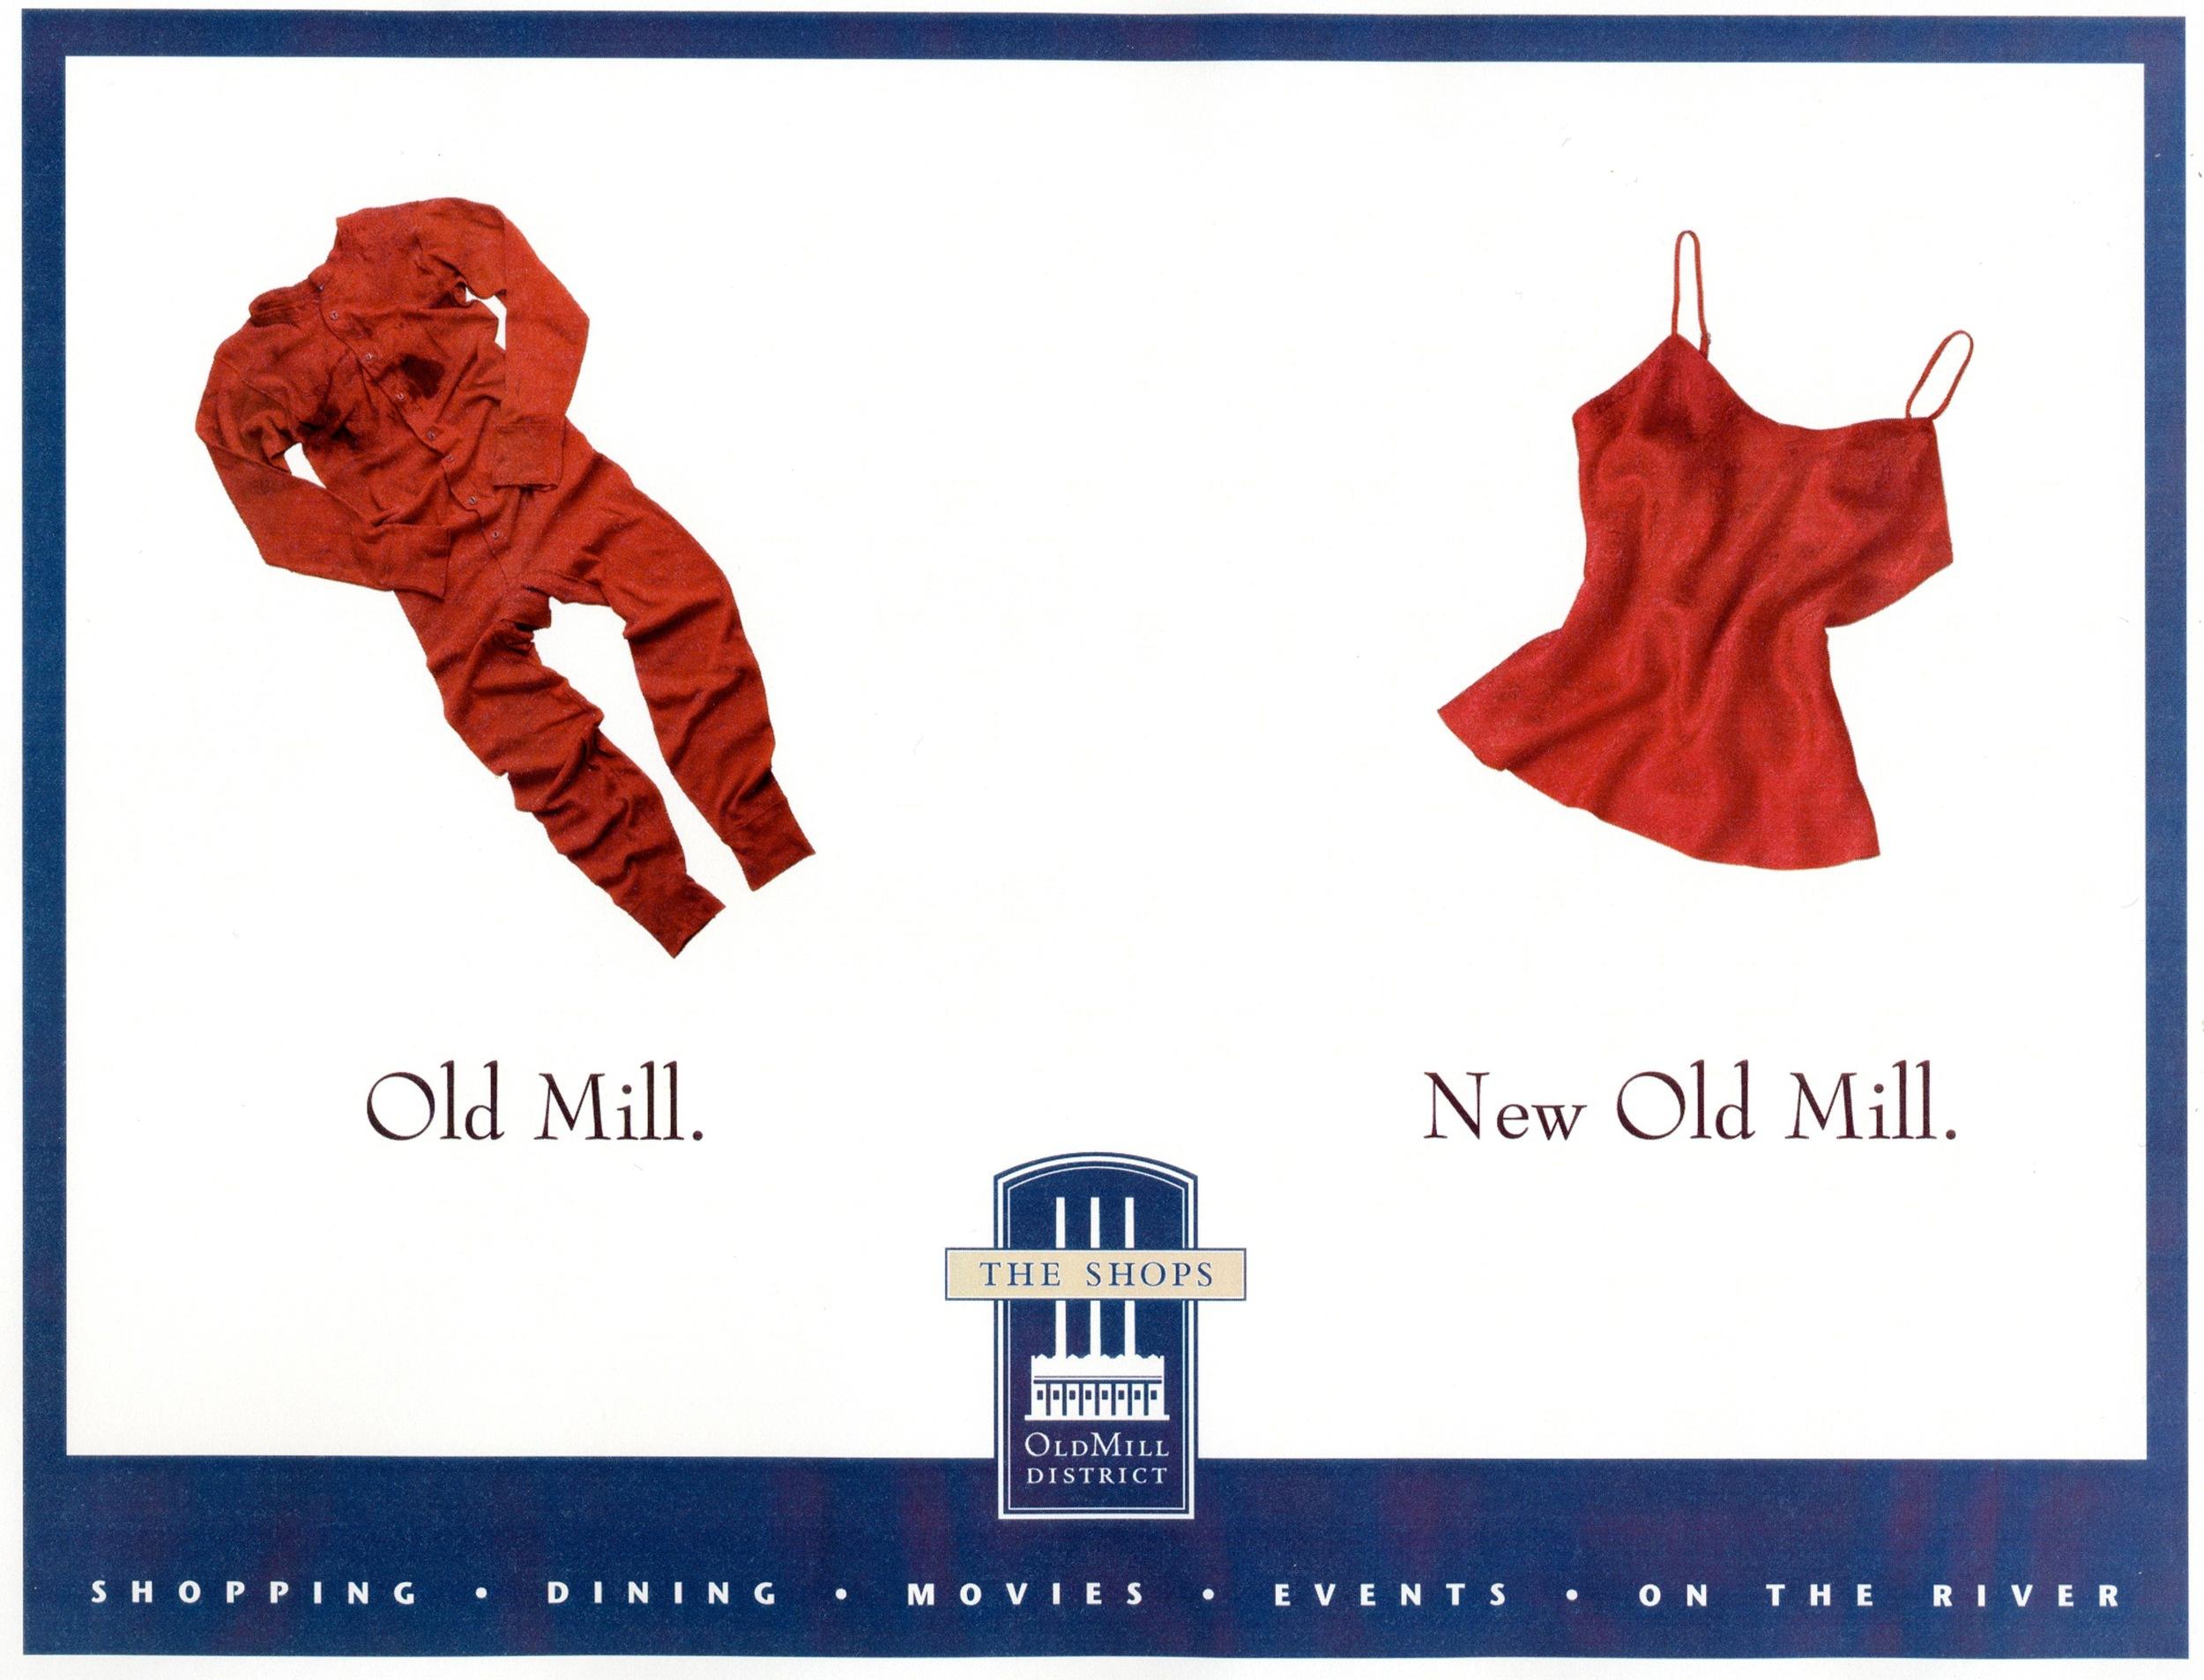 New Old Mill Teddy.jpg